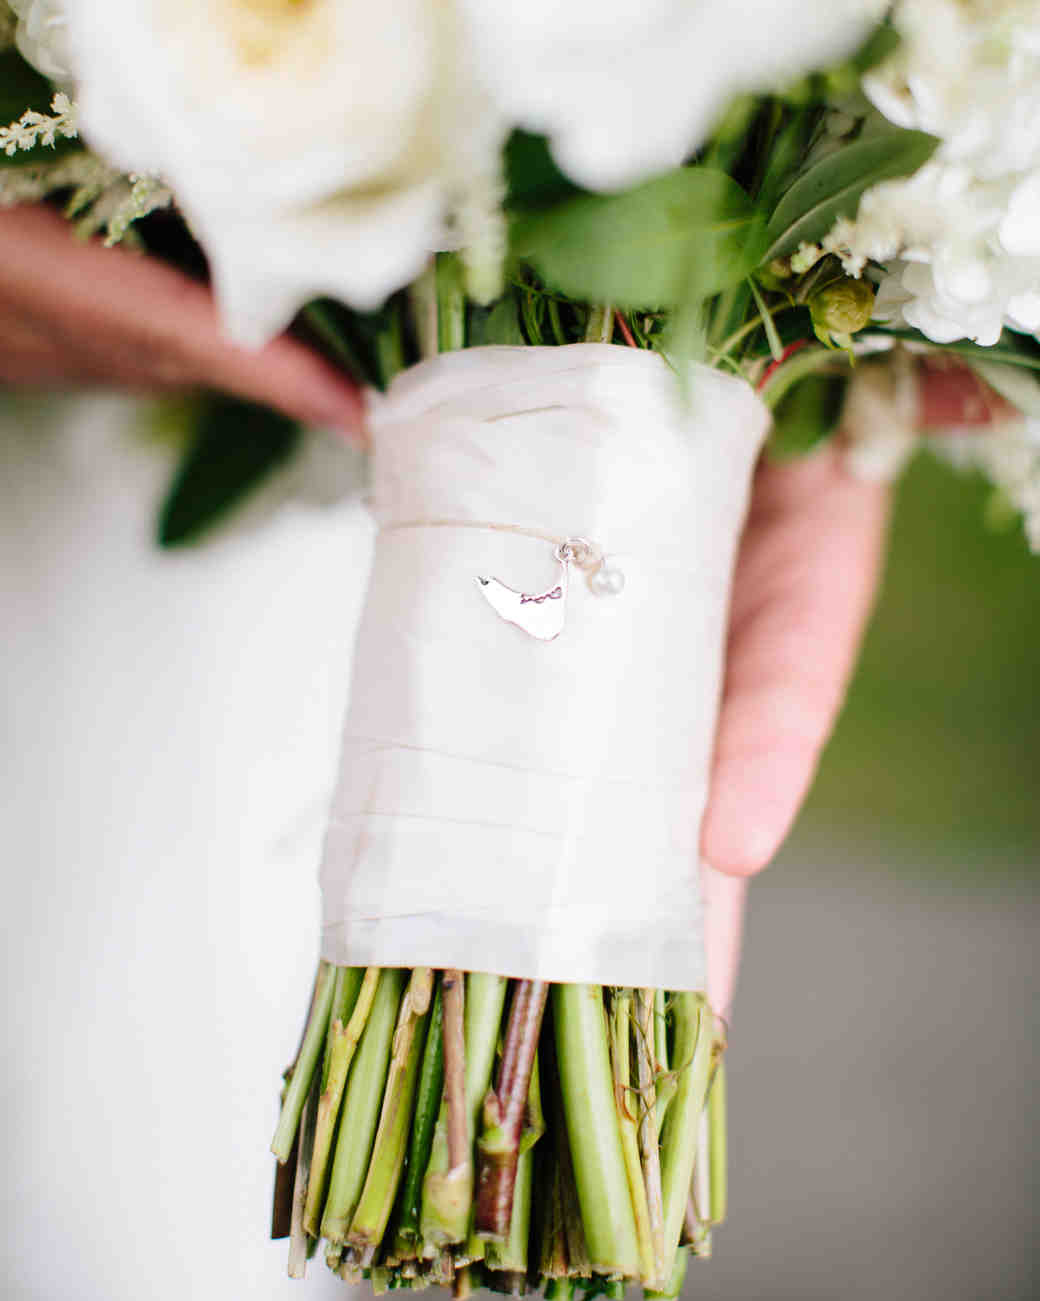 kristen-jonathan-wedding-charm-1084-s112193-1015.jpg